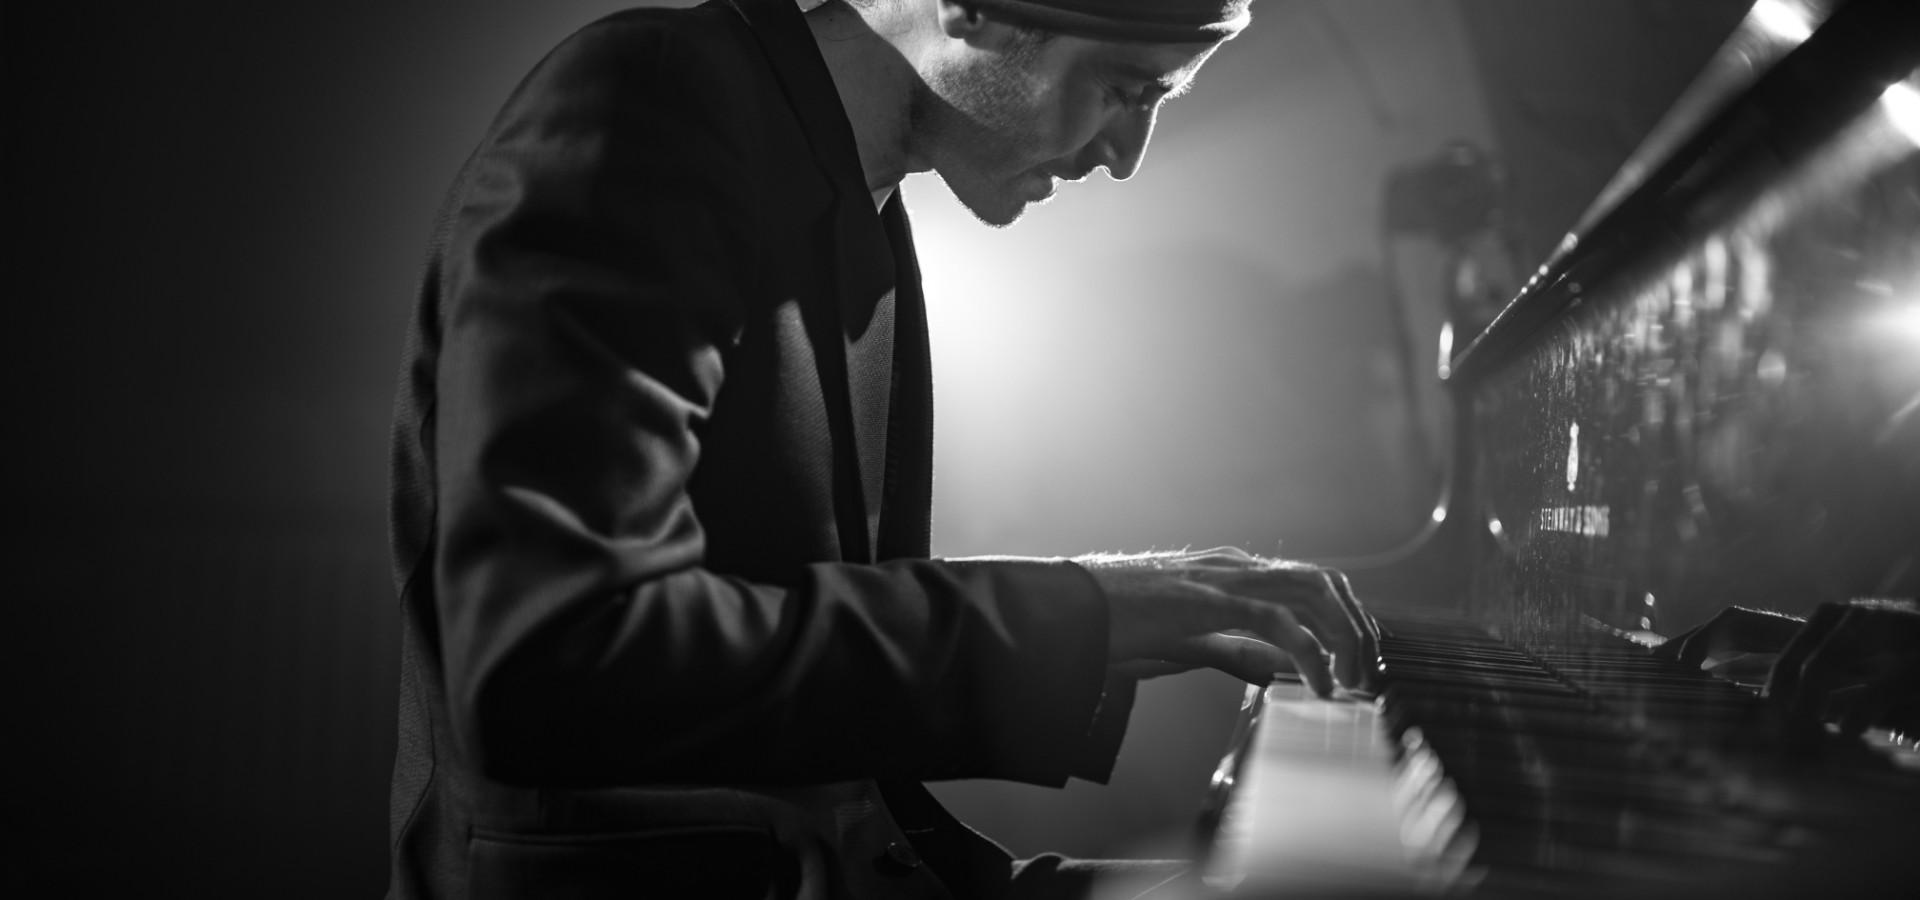 Песни Апшерона. Риад Маммадов. Концерт в оранжерее ВДНХ фото